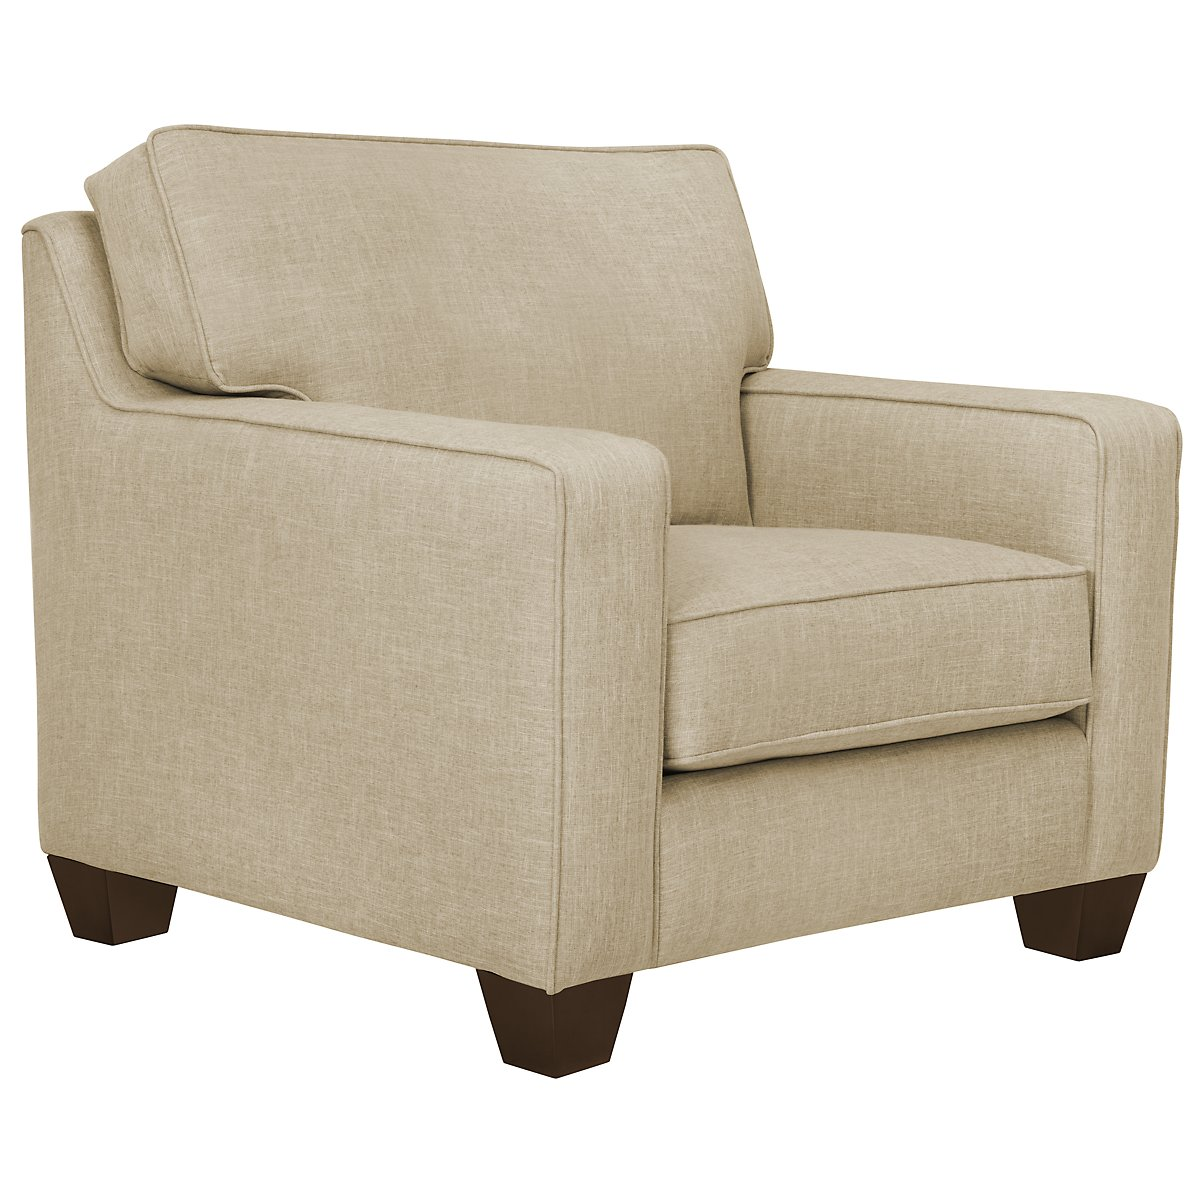 York Beige Fabric Chair